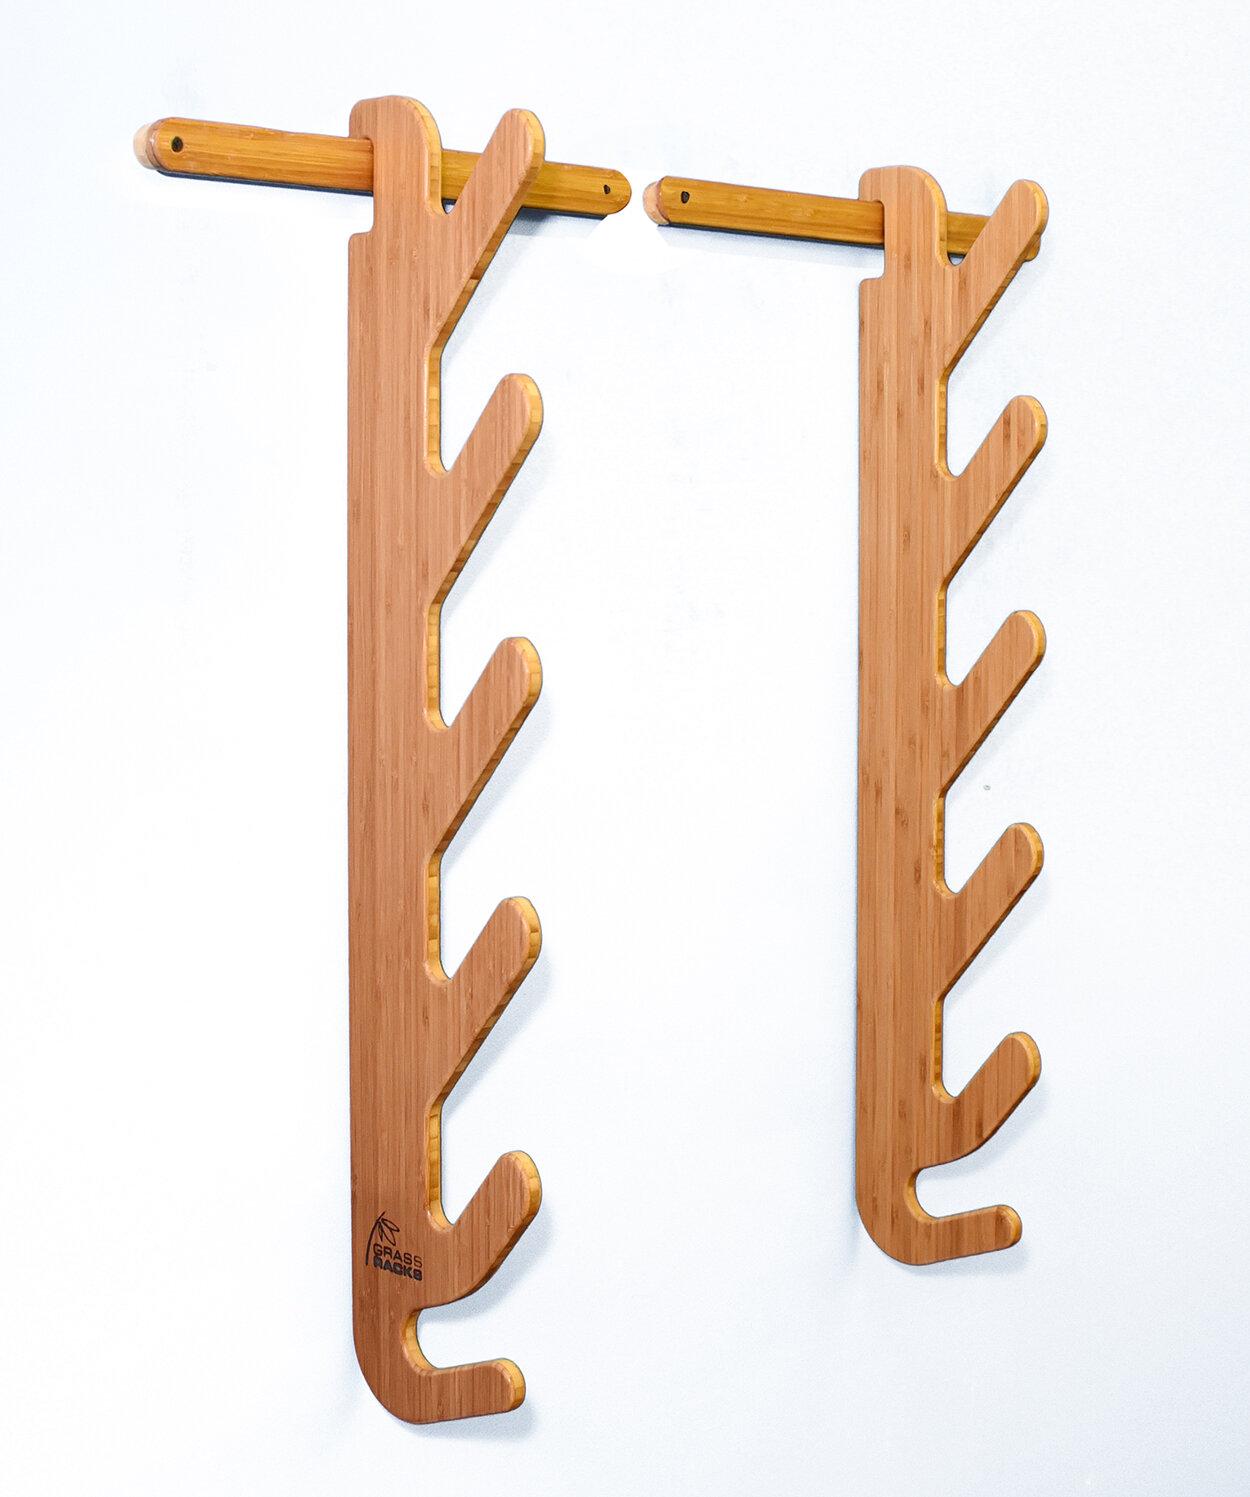 Grassracks Bamboo Snowboard Wall Rack for 4 Snowboards or Longboards Molokai Quad